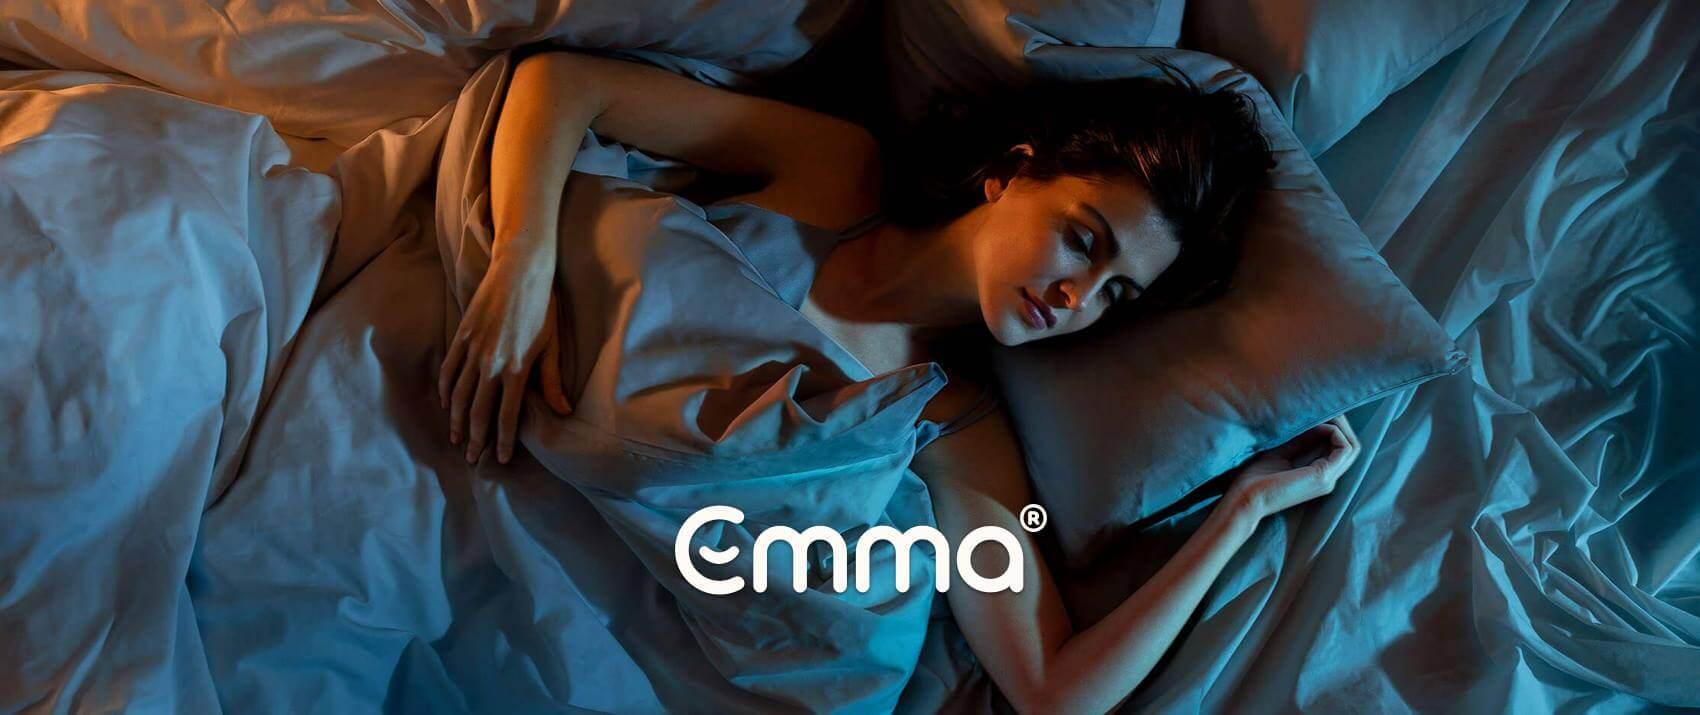 emma-gallery